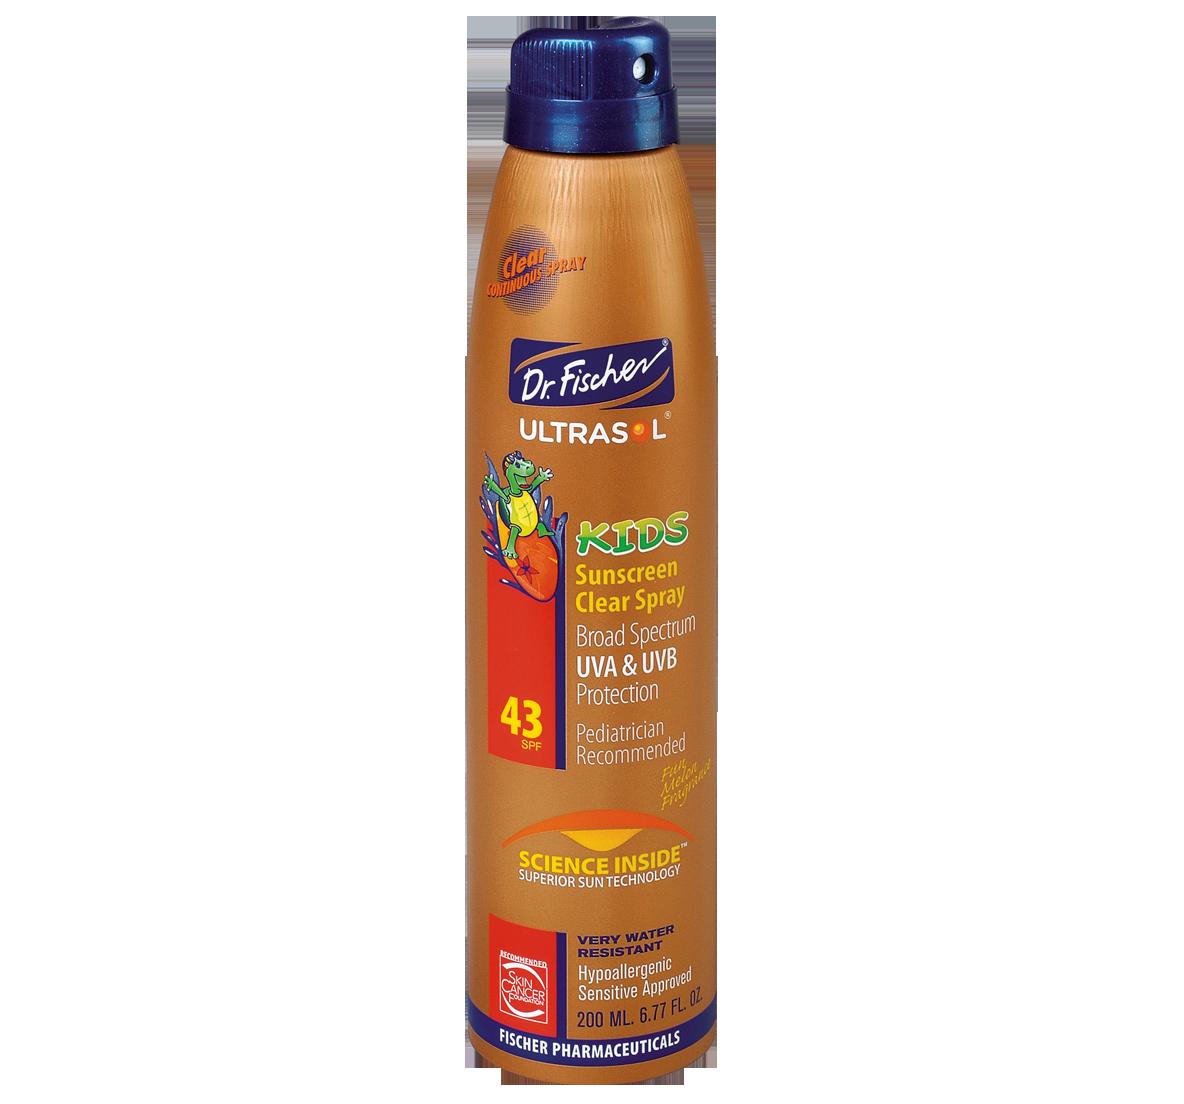 E_ultrasol kids clear spray_SPF43_1184x1104